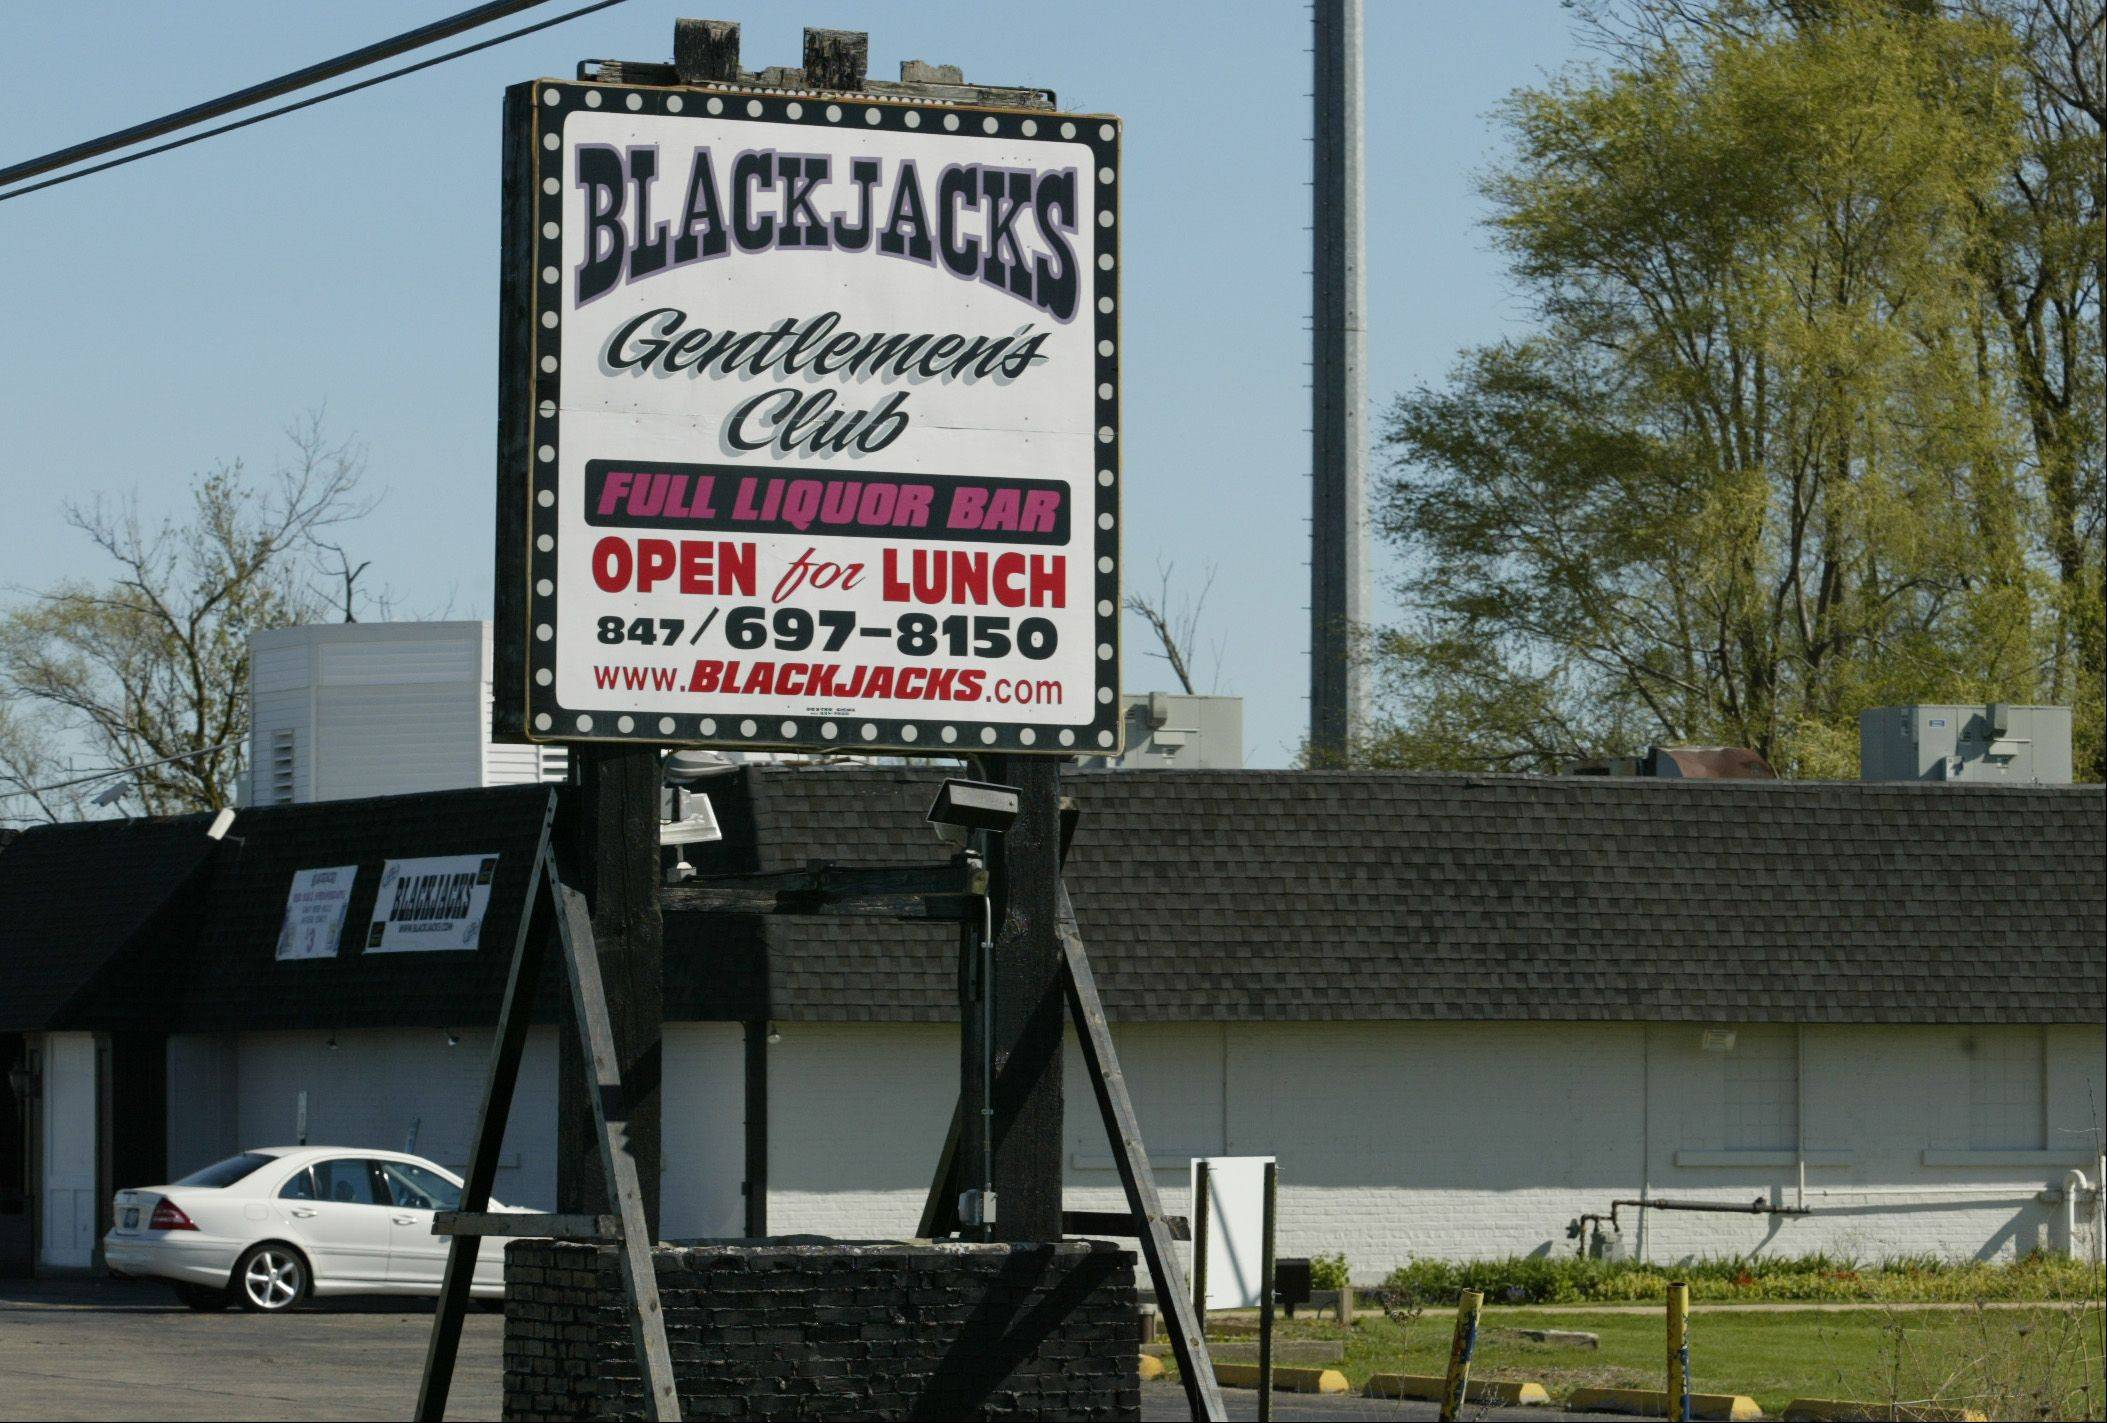 Black jack strip club in illinois